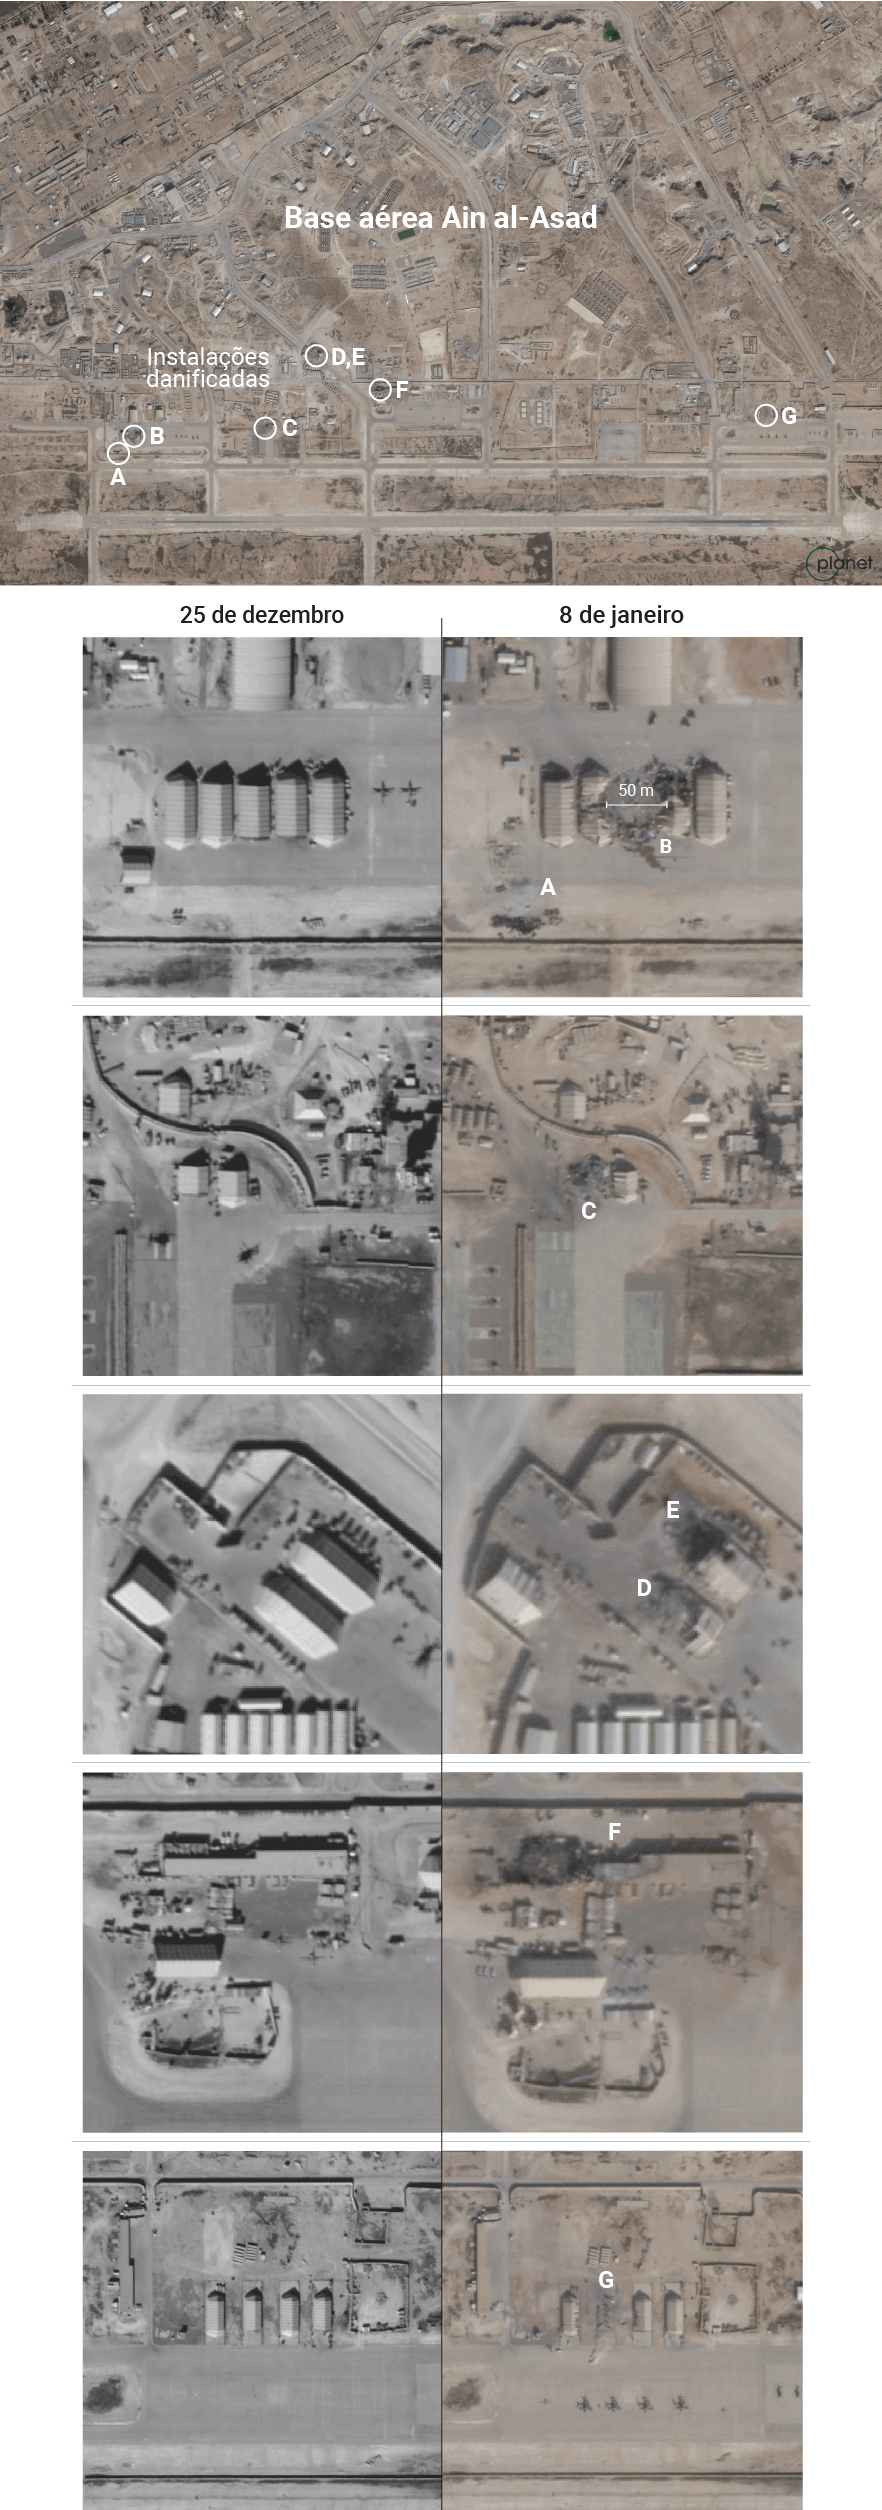 imagens de satélite da base aérea norte americana bombardeada